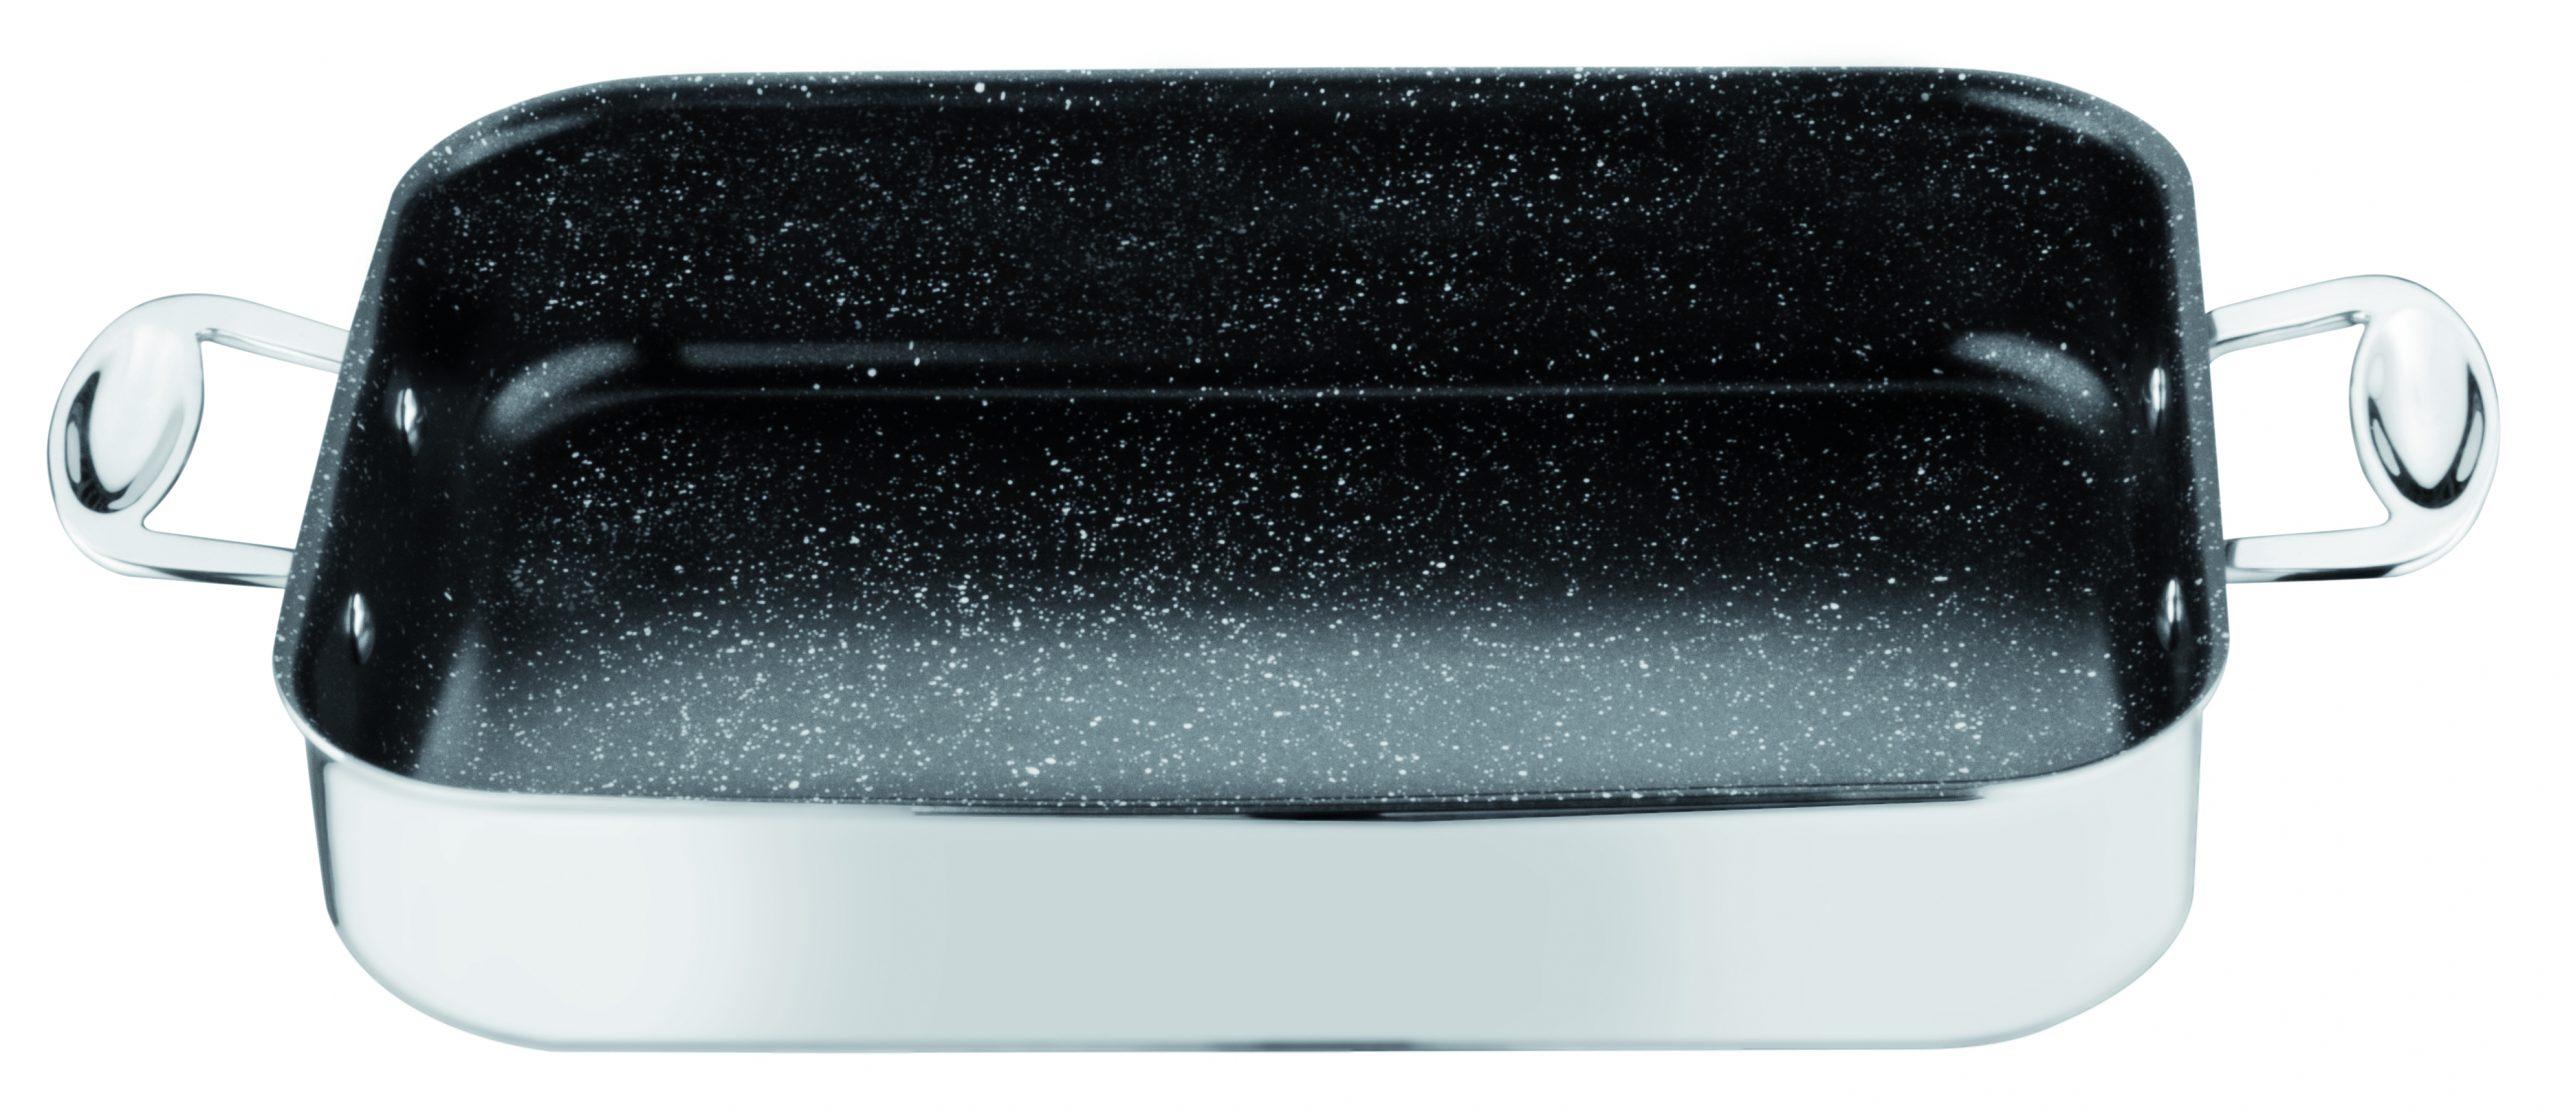 Lasagne schaal 'Glamour Stone' 35 x 25 cm